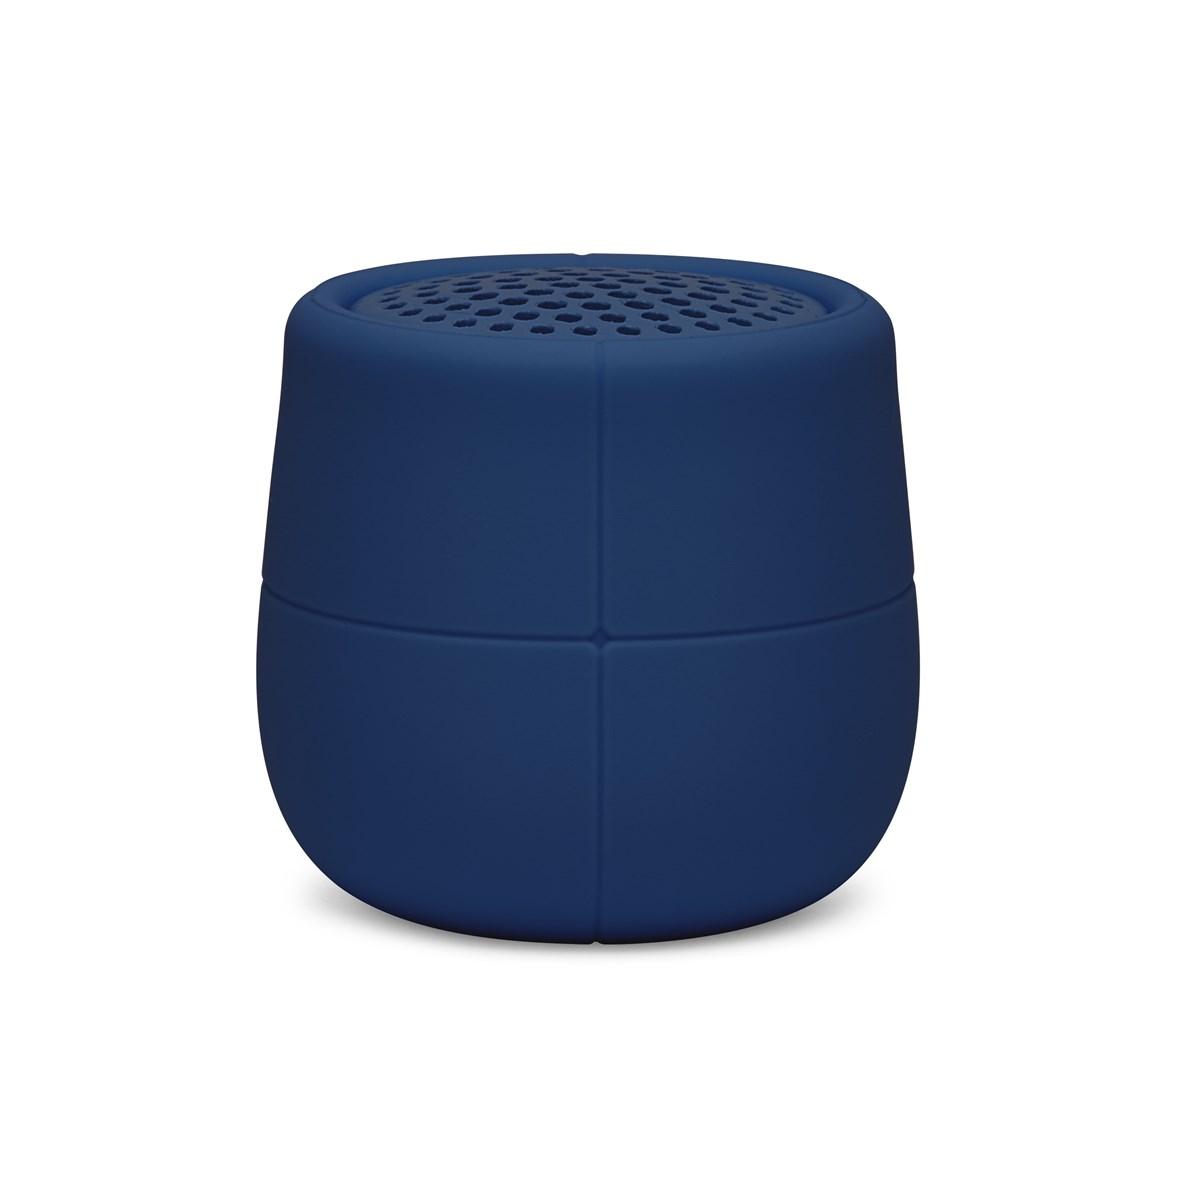 Enceinte flottante Bluetooth en Gomme Bleu marine